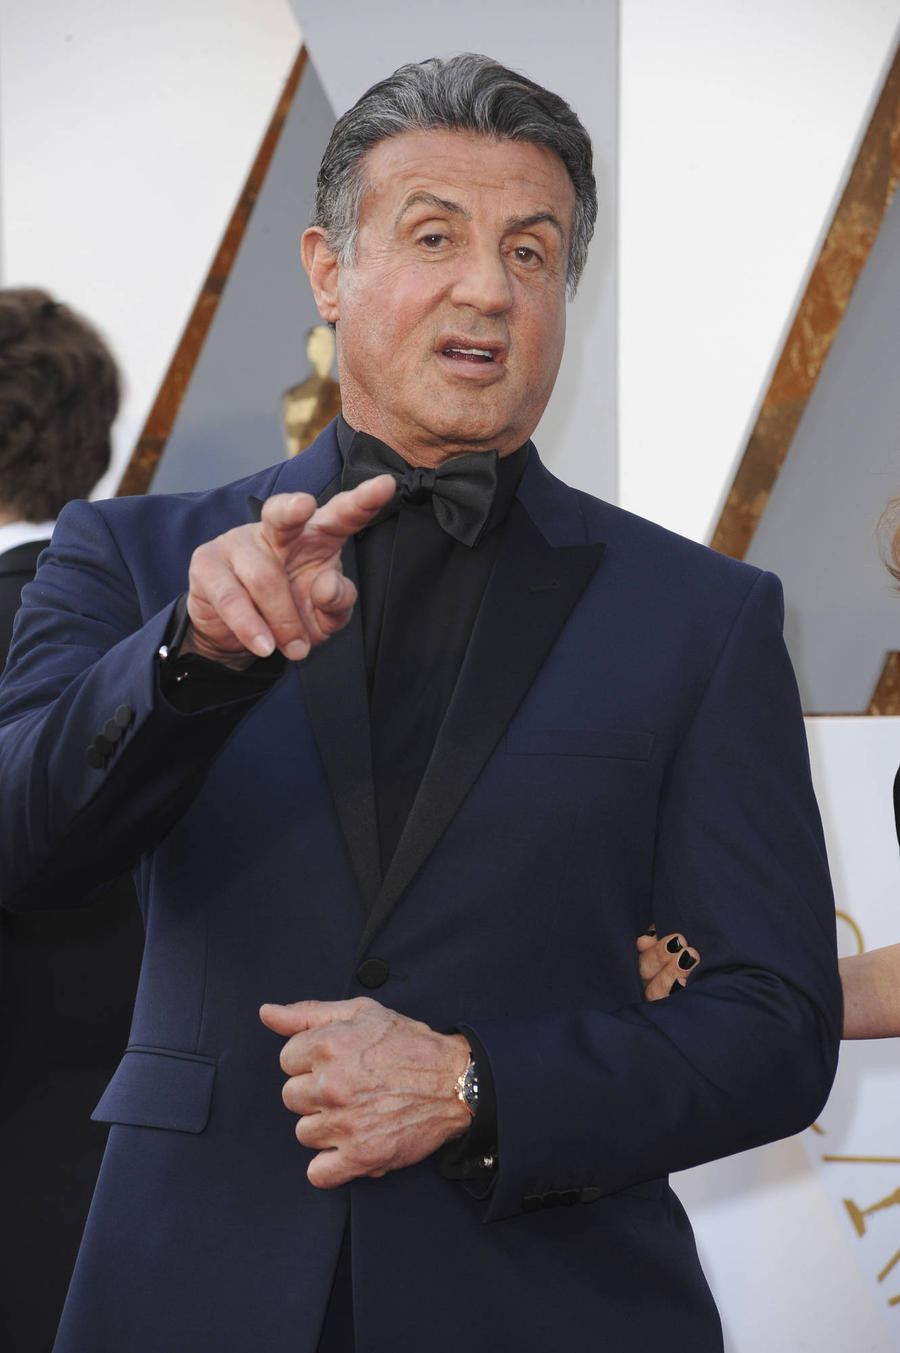 Arnold Schwarzenegger Consoles 'Winner' Sylvester Stallone After Oscar Loss